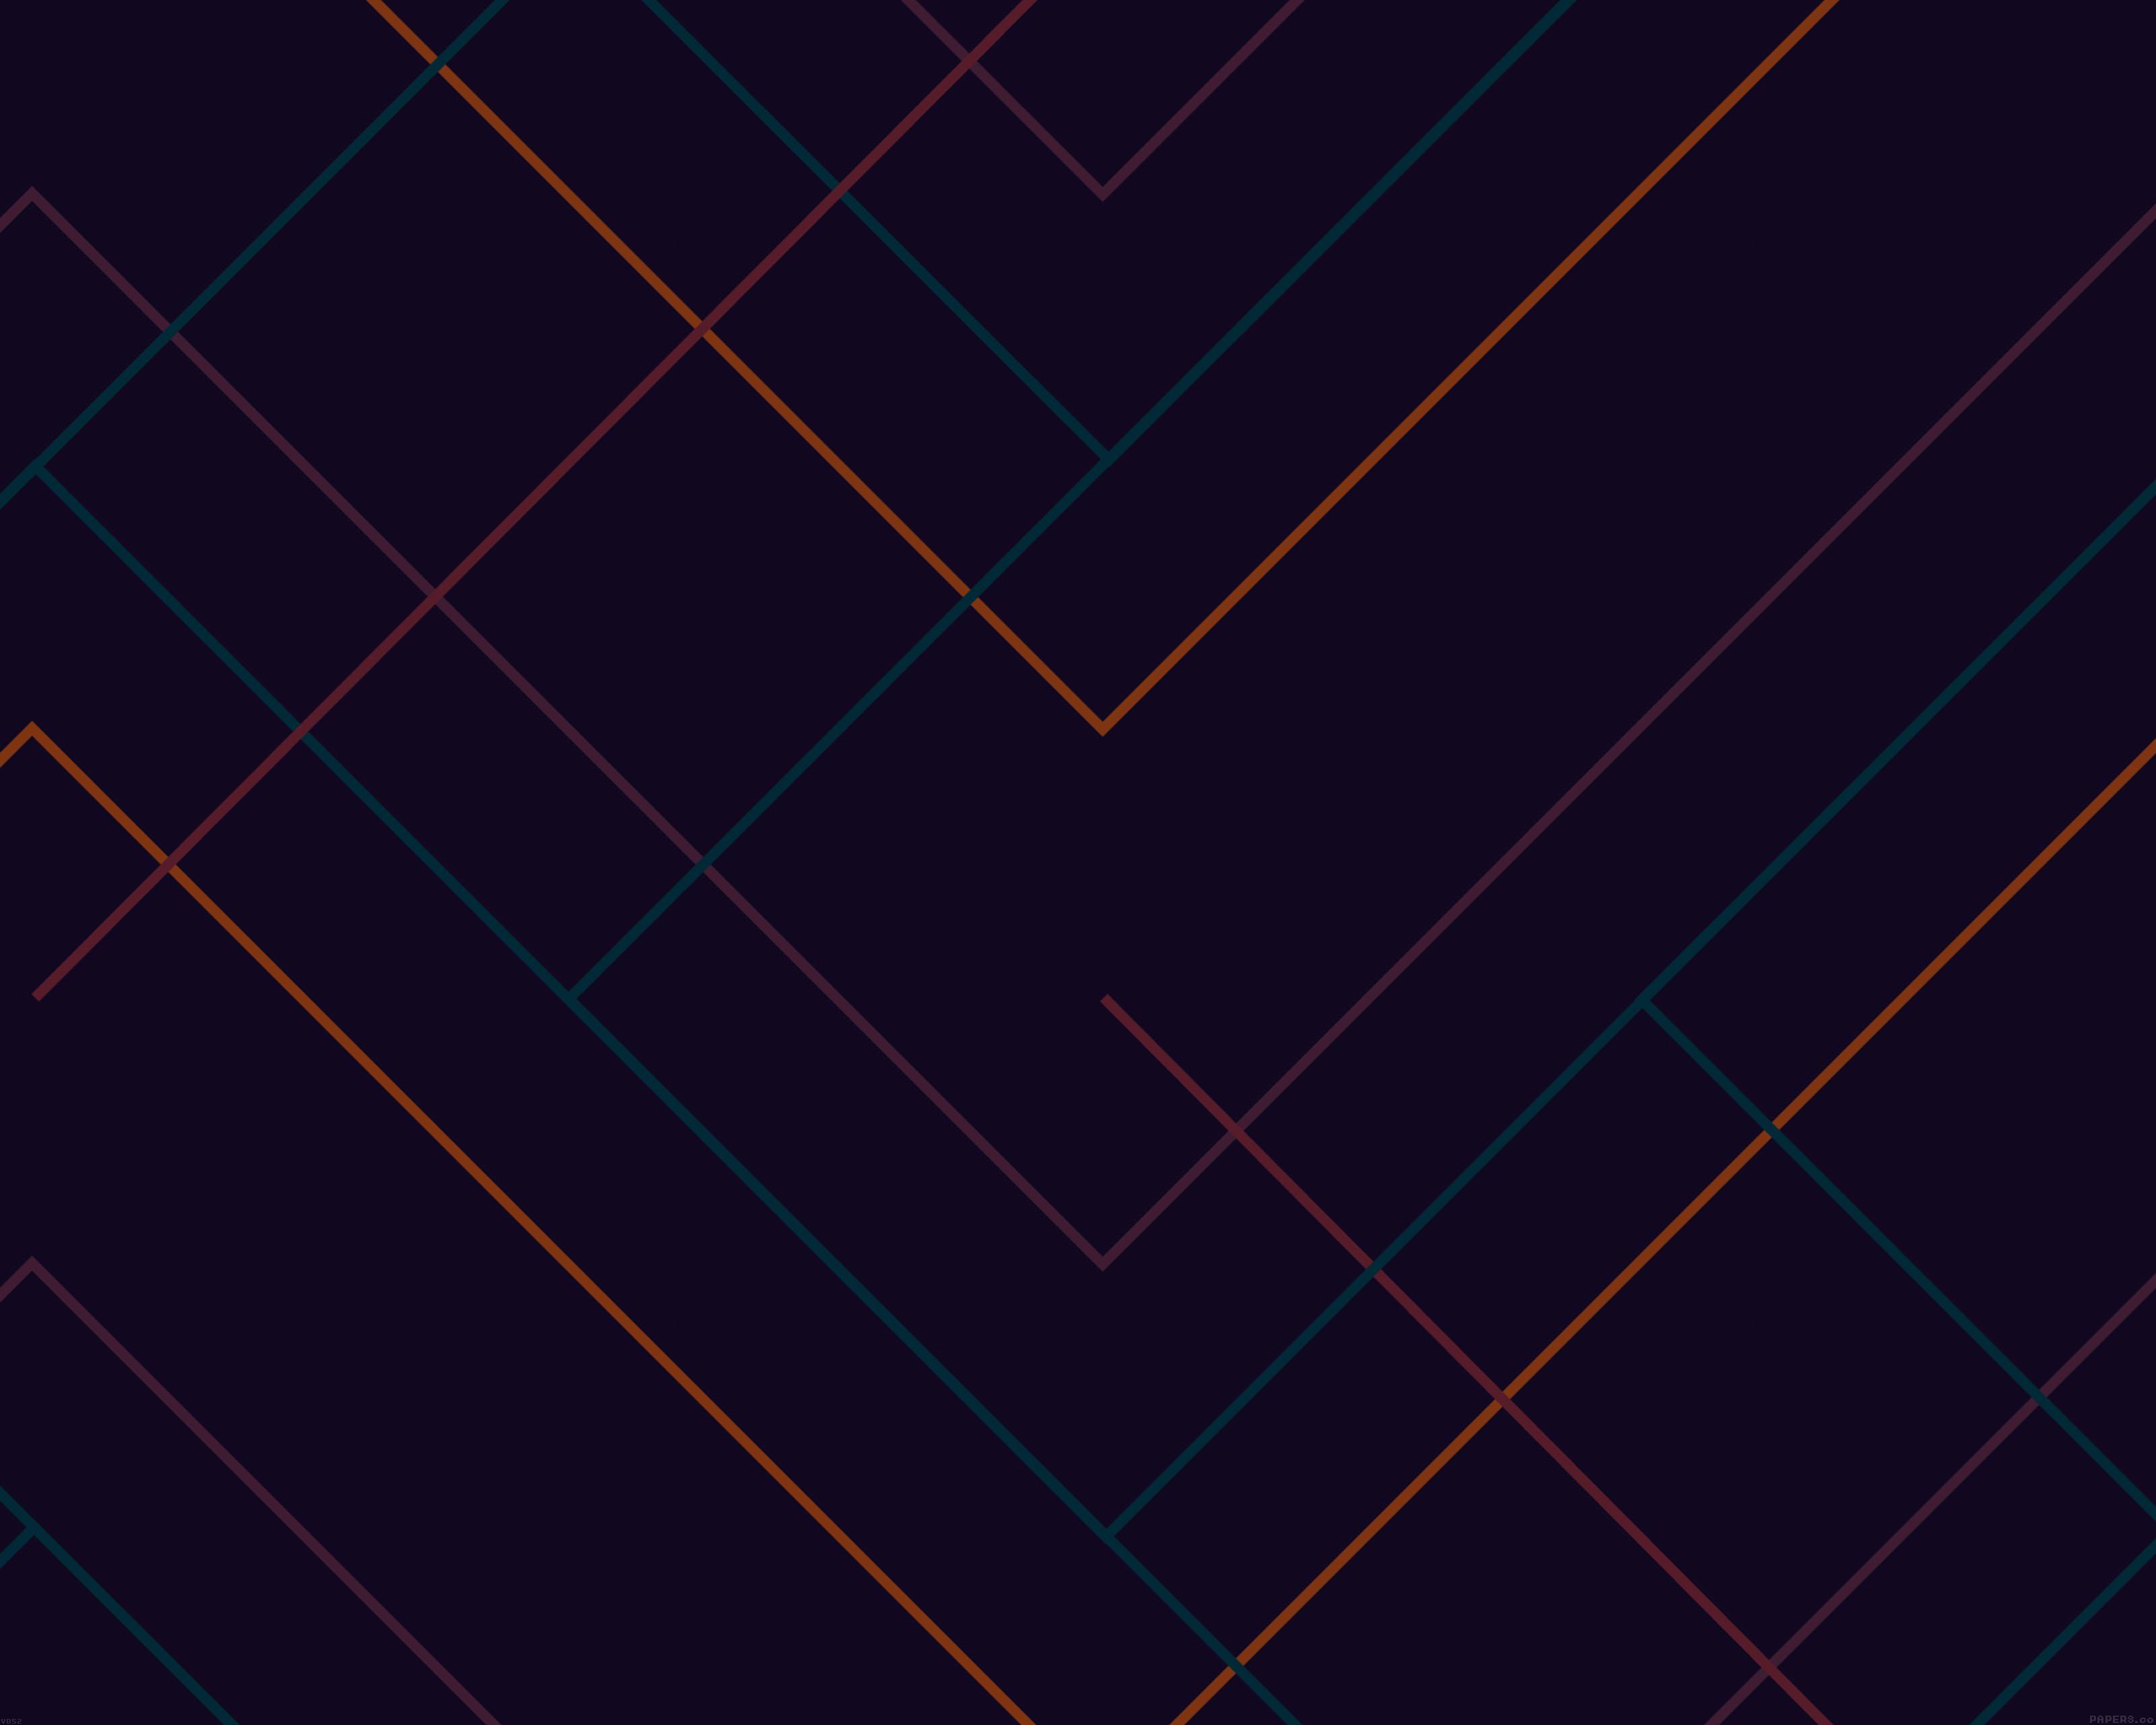 geometric galaxy wallpaper - photo #37